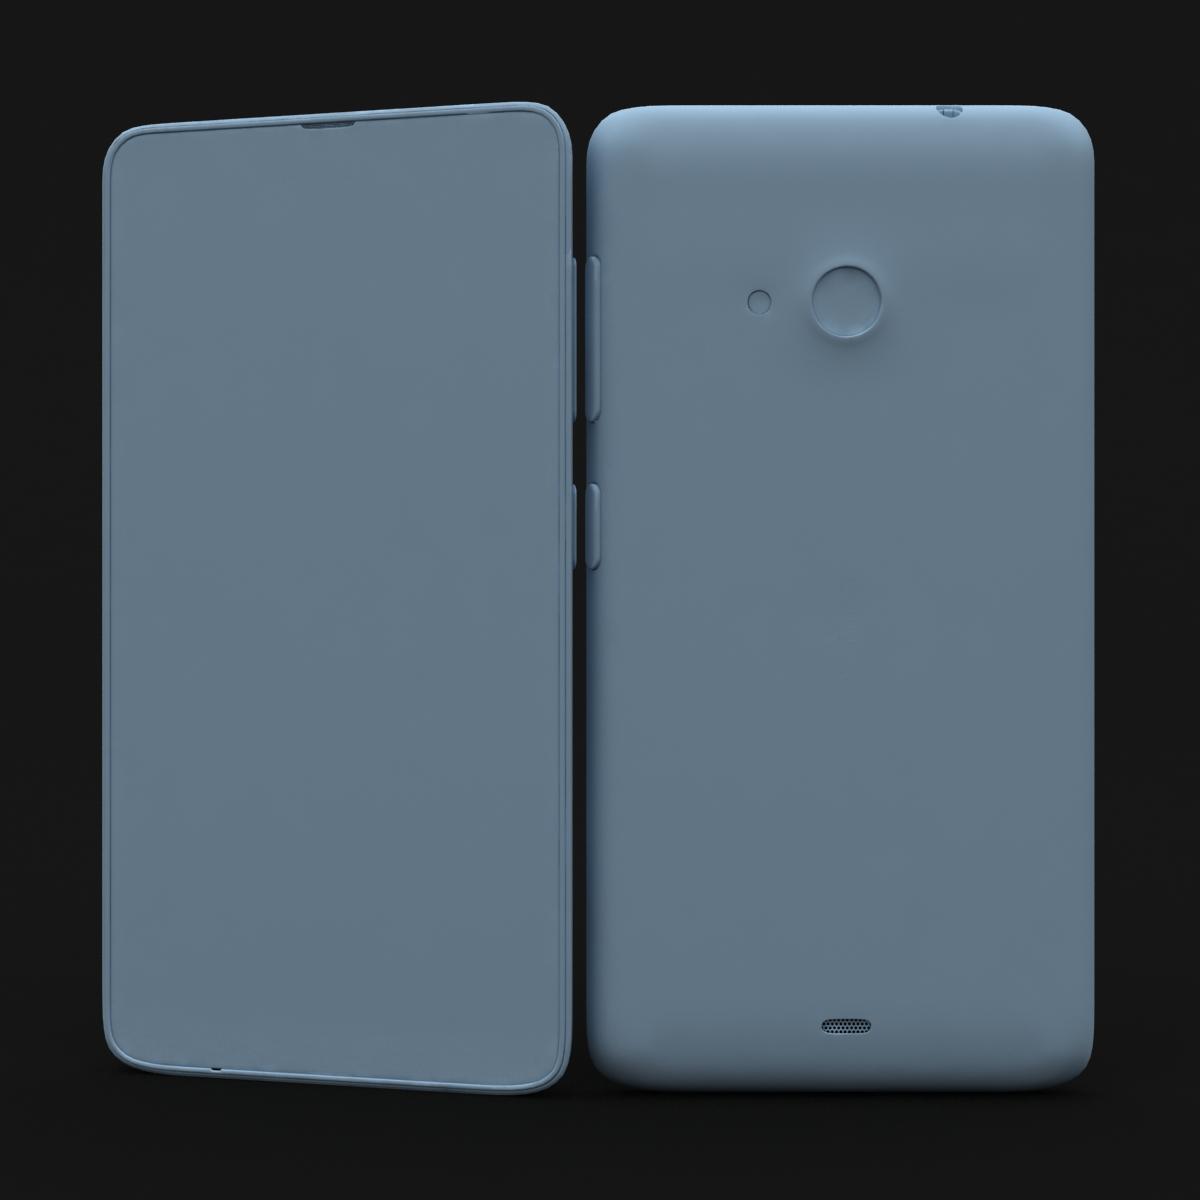 microsoft lumia 535 and dual sim green 3d model 3ds max fbx c4d obj 204187